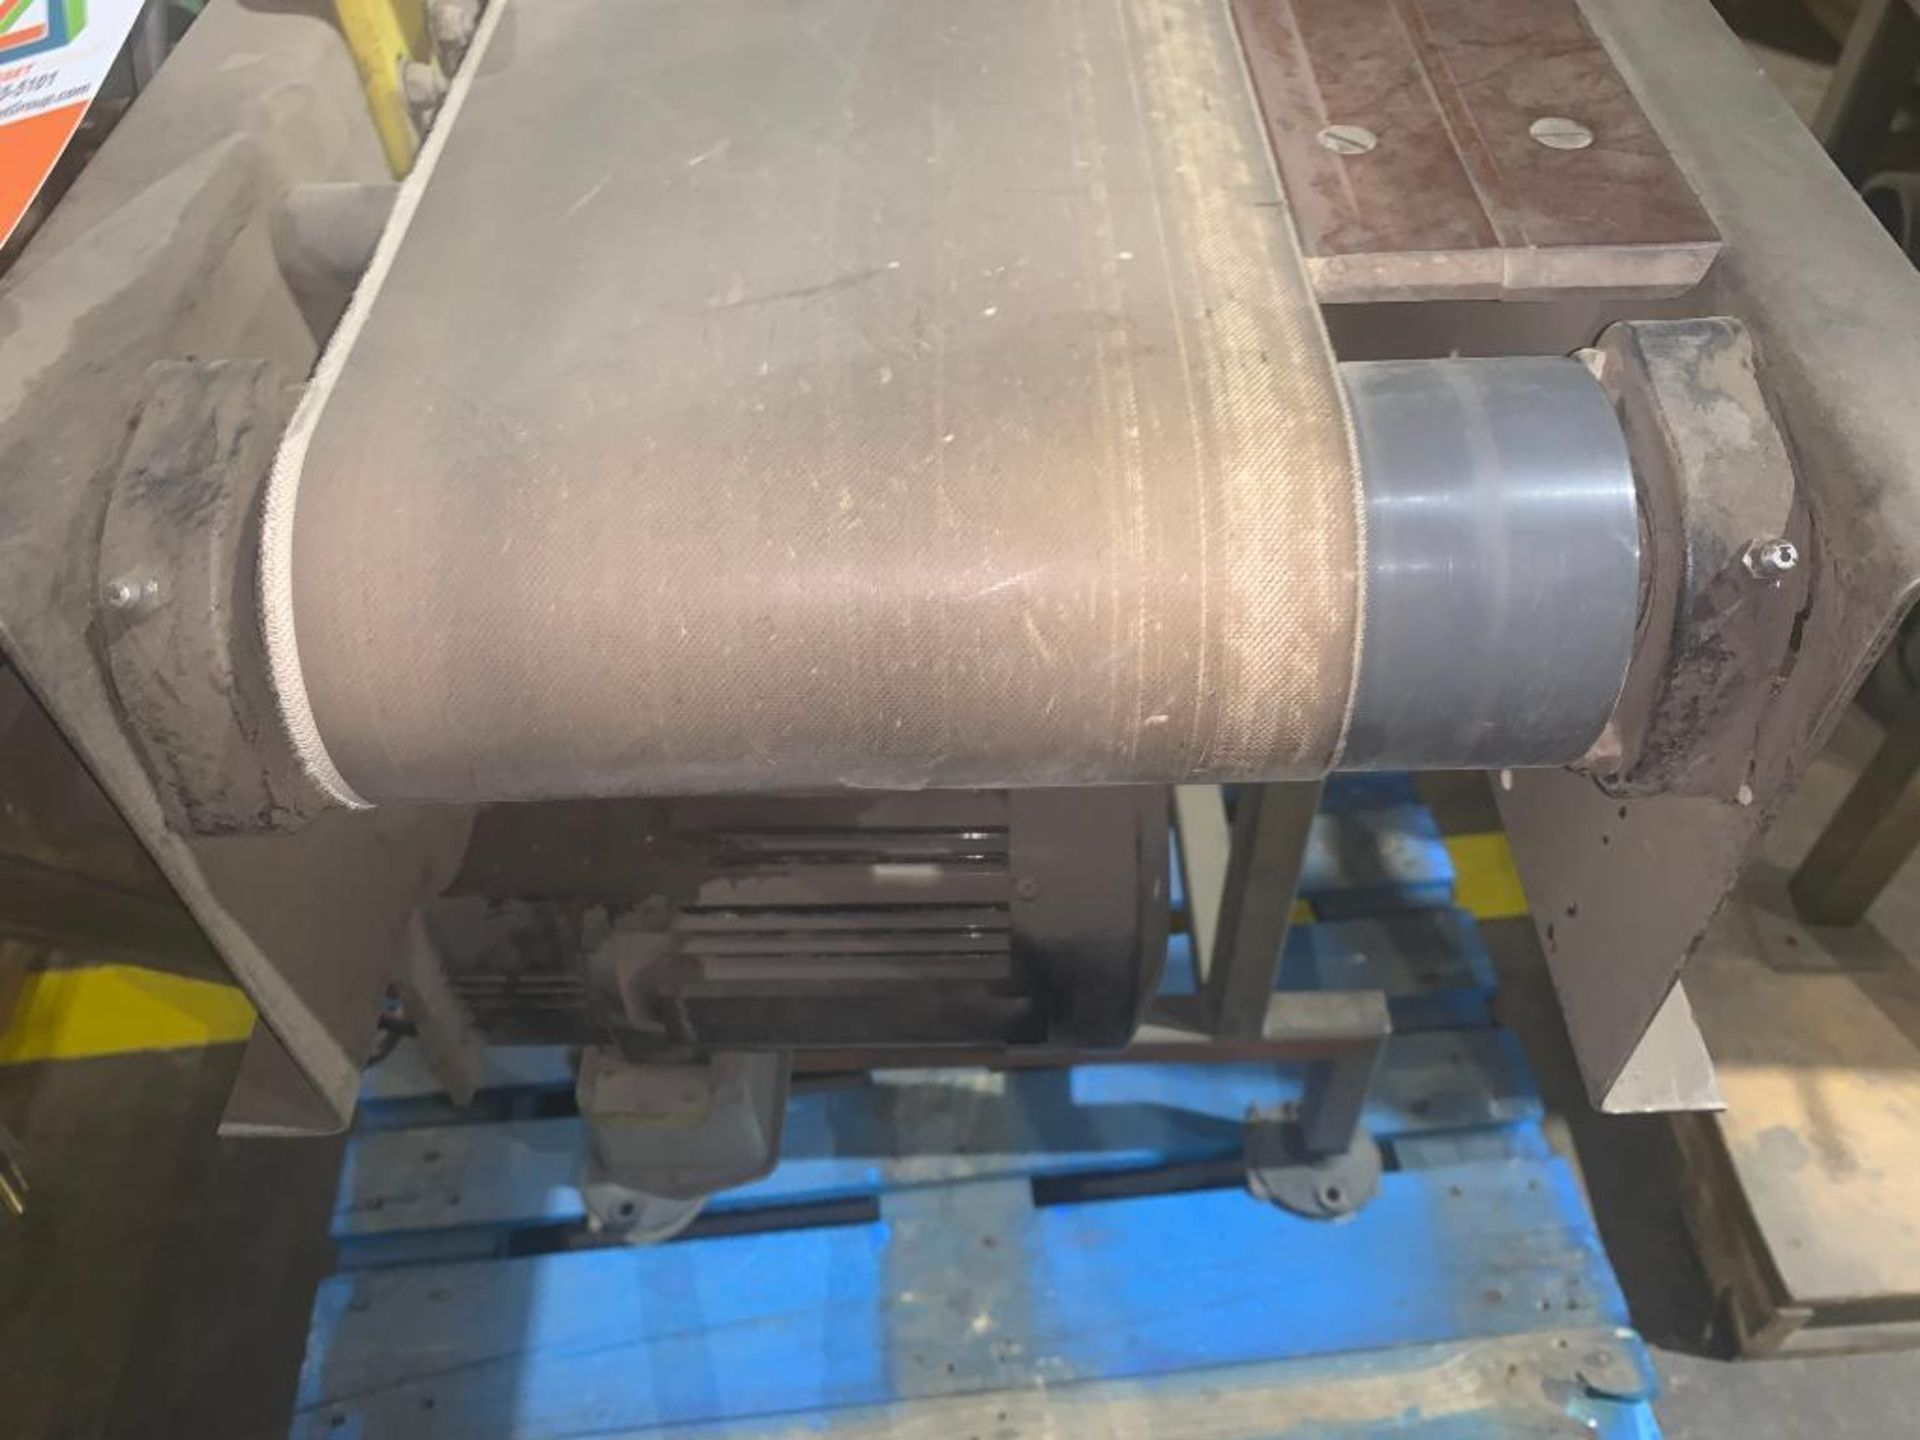 Loma metal detector - Image 6 of 10